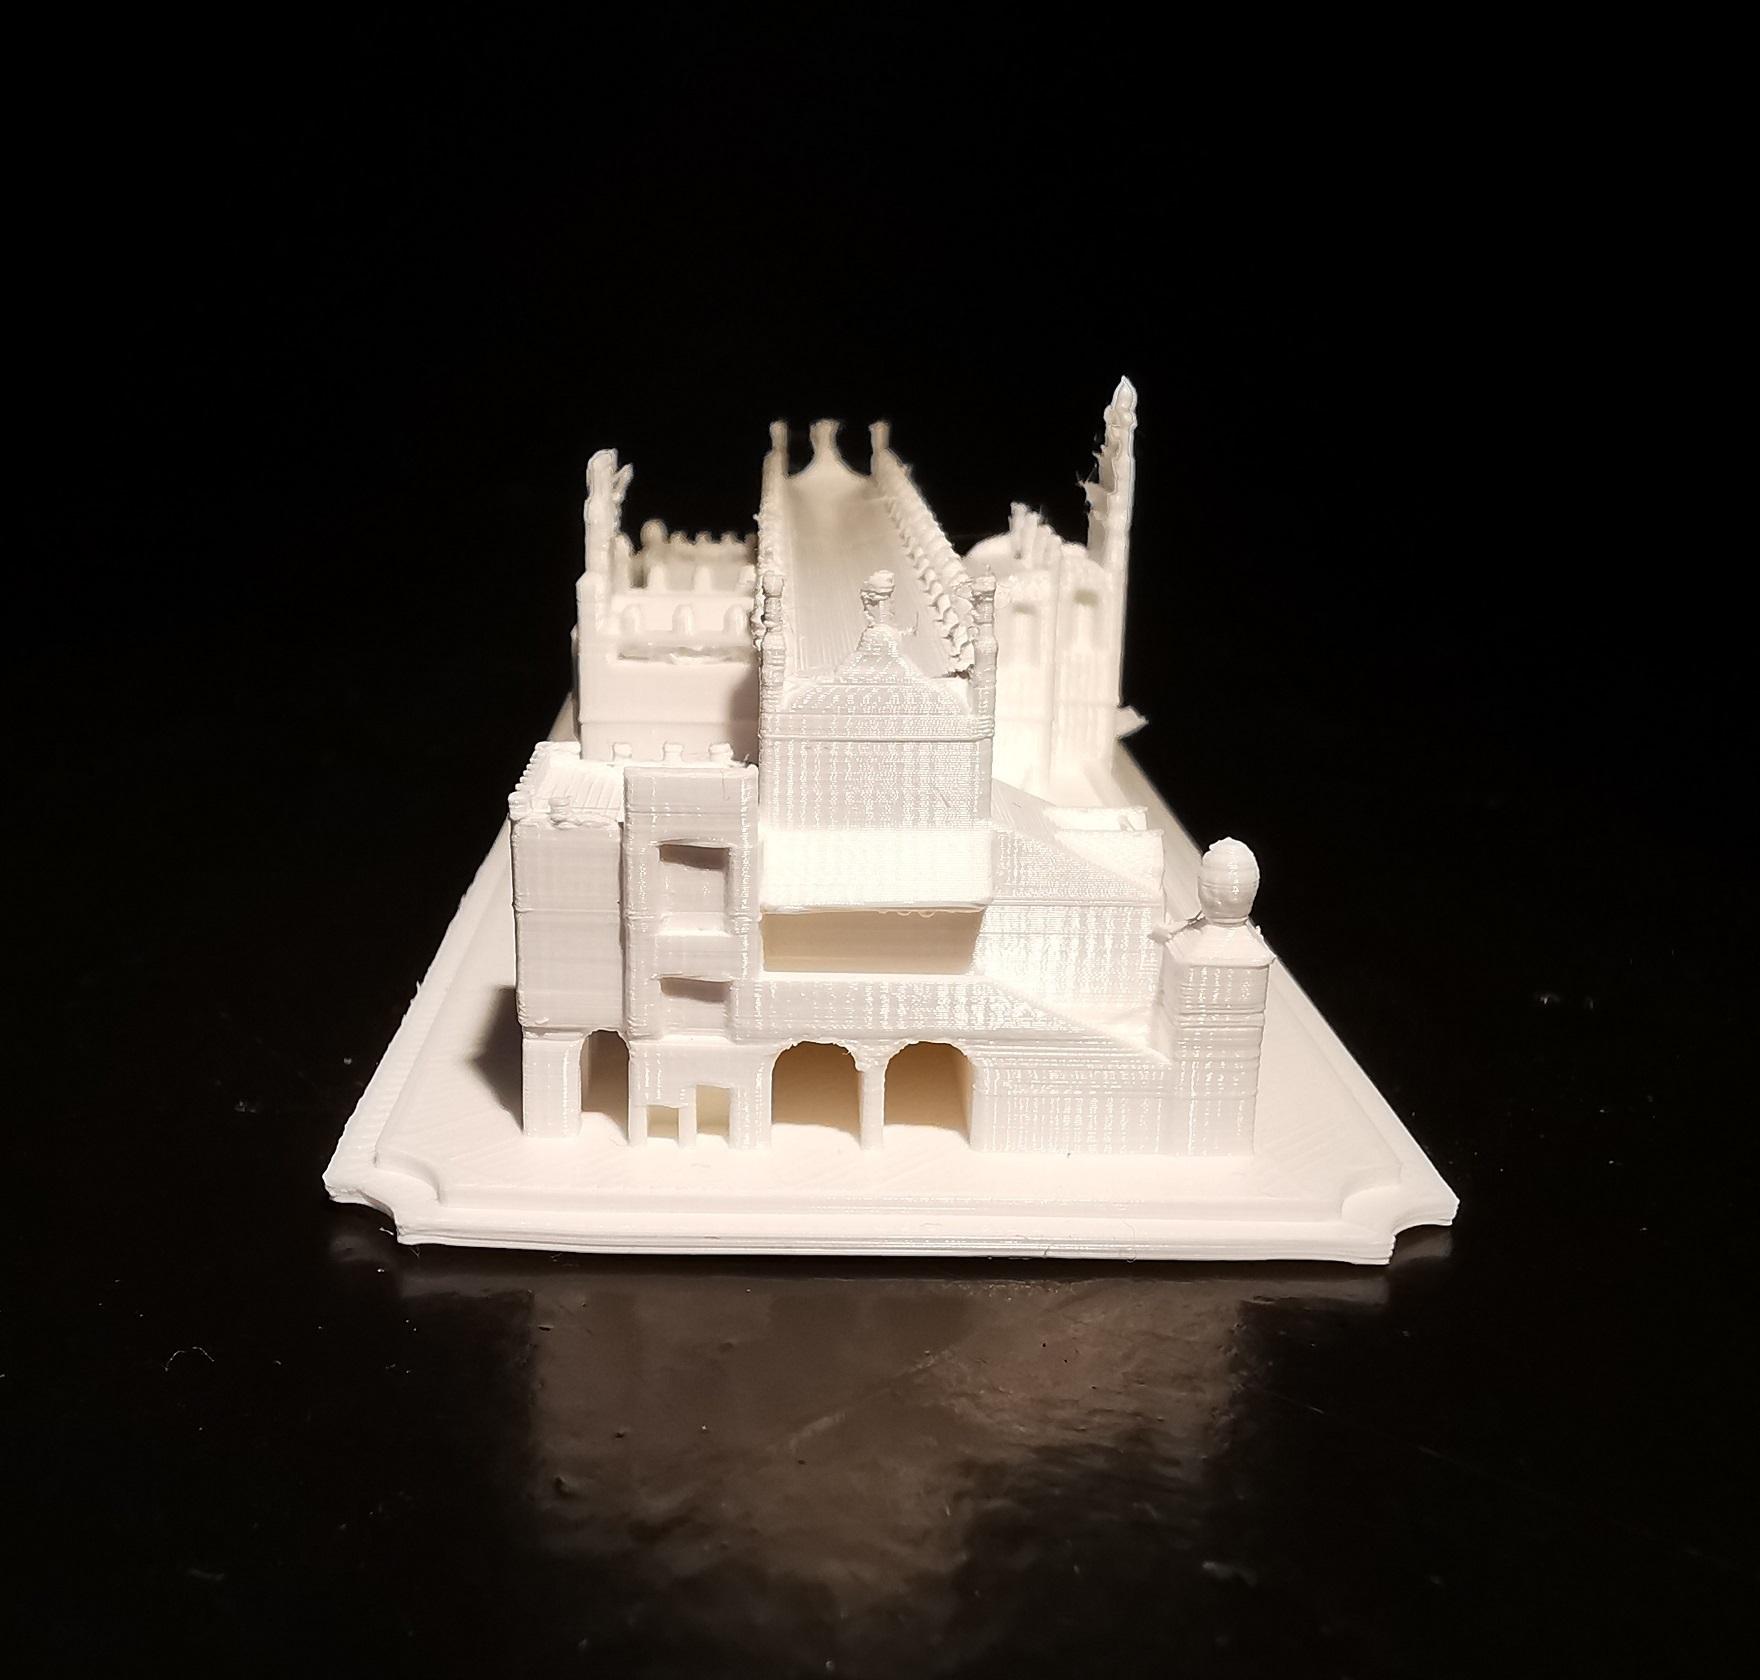 Sukiennice_03.jpg Download STL file Sukiennice - Kraków Cloth Hall • 3D printable design, eAgent